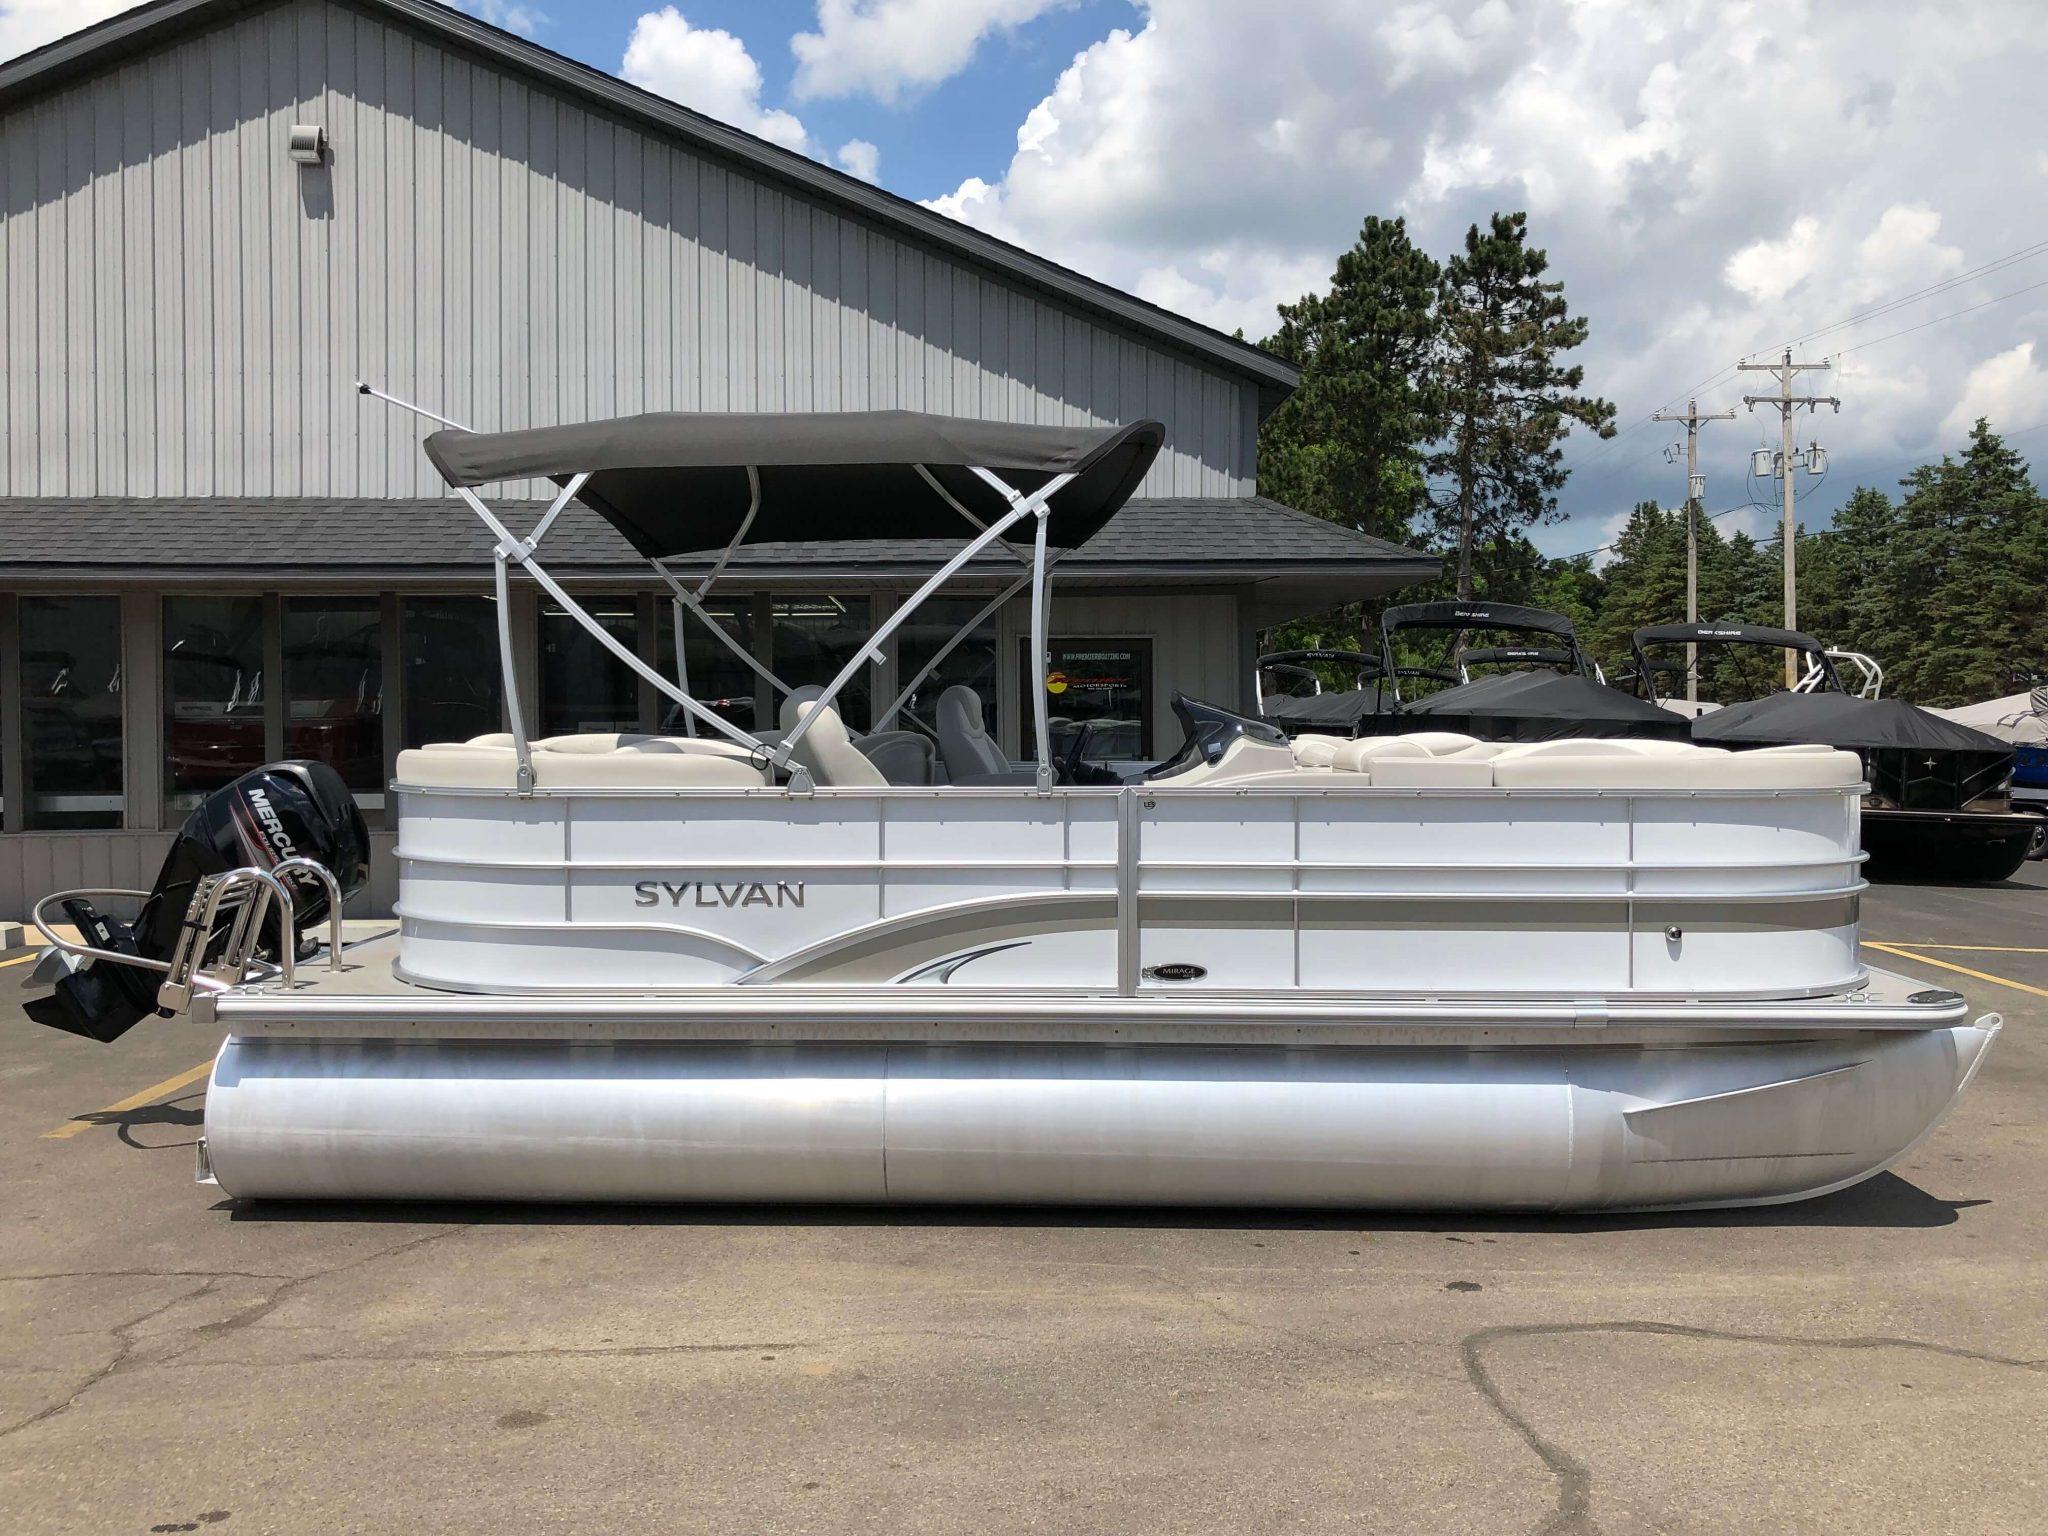 2016 Sylvan 8520 LZ LES Pontoon Boat 9